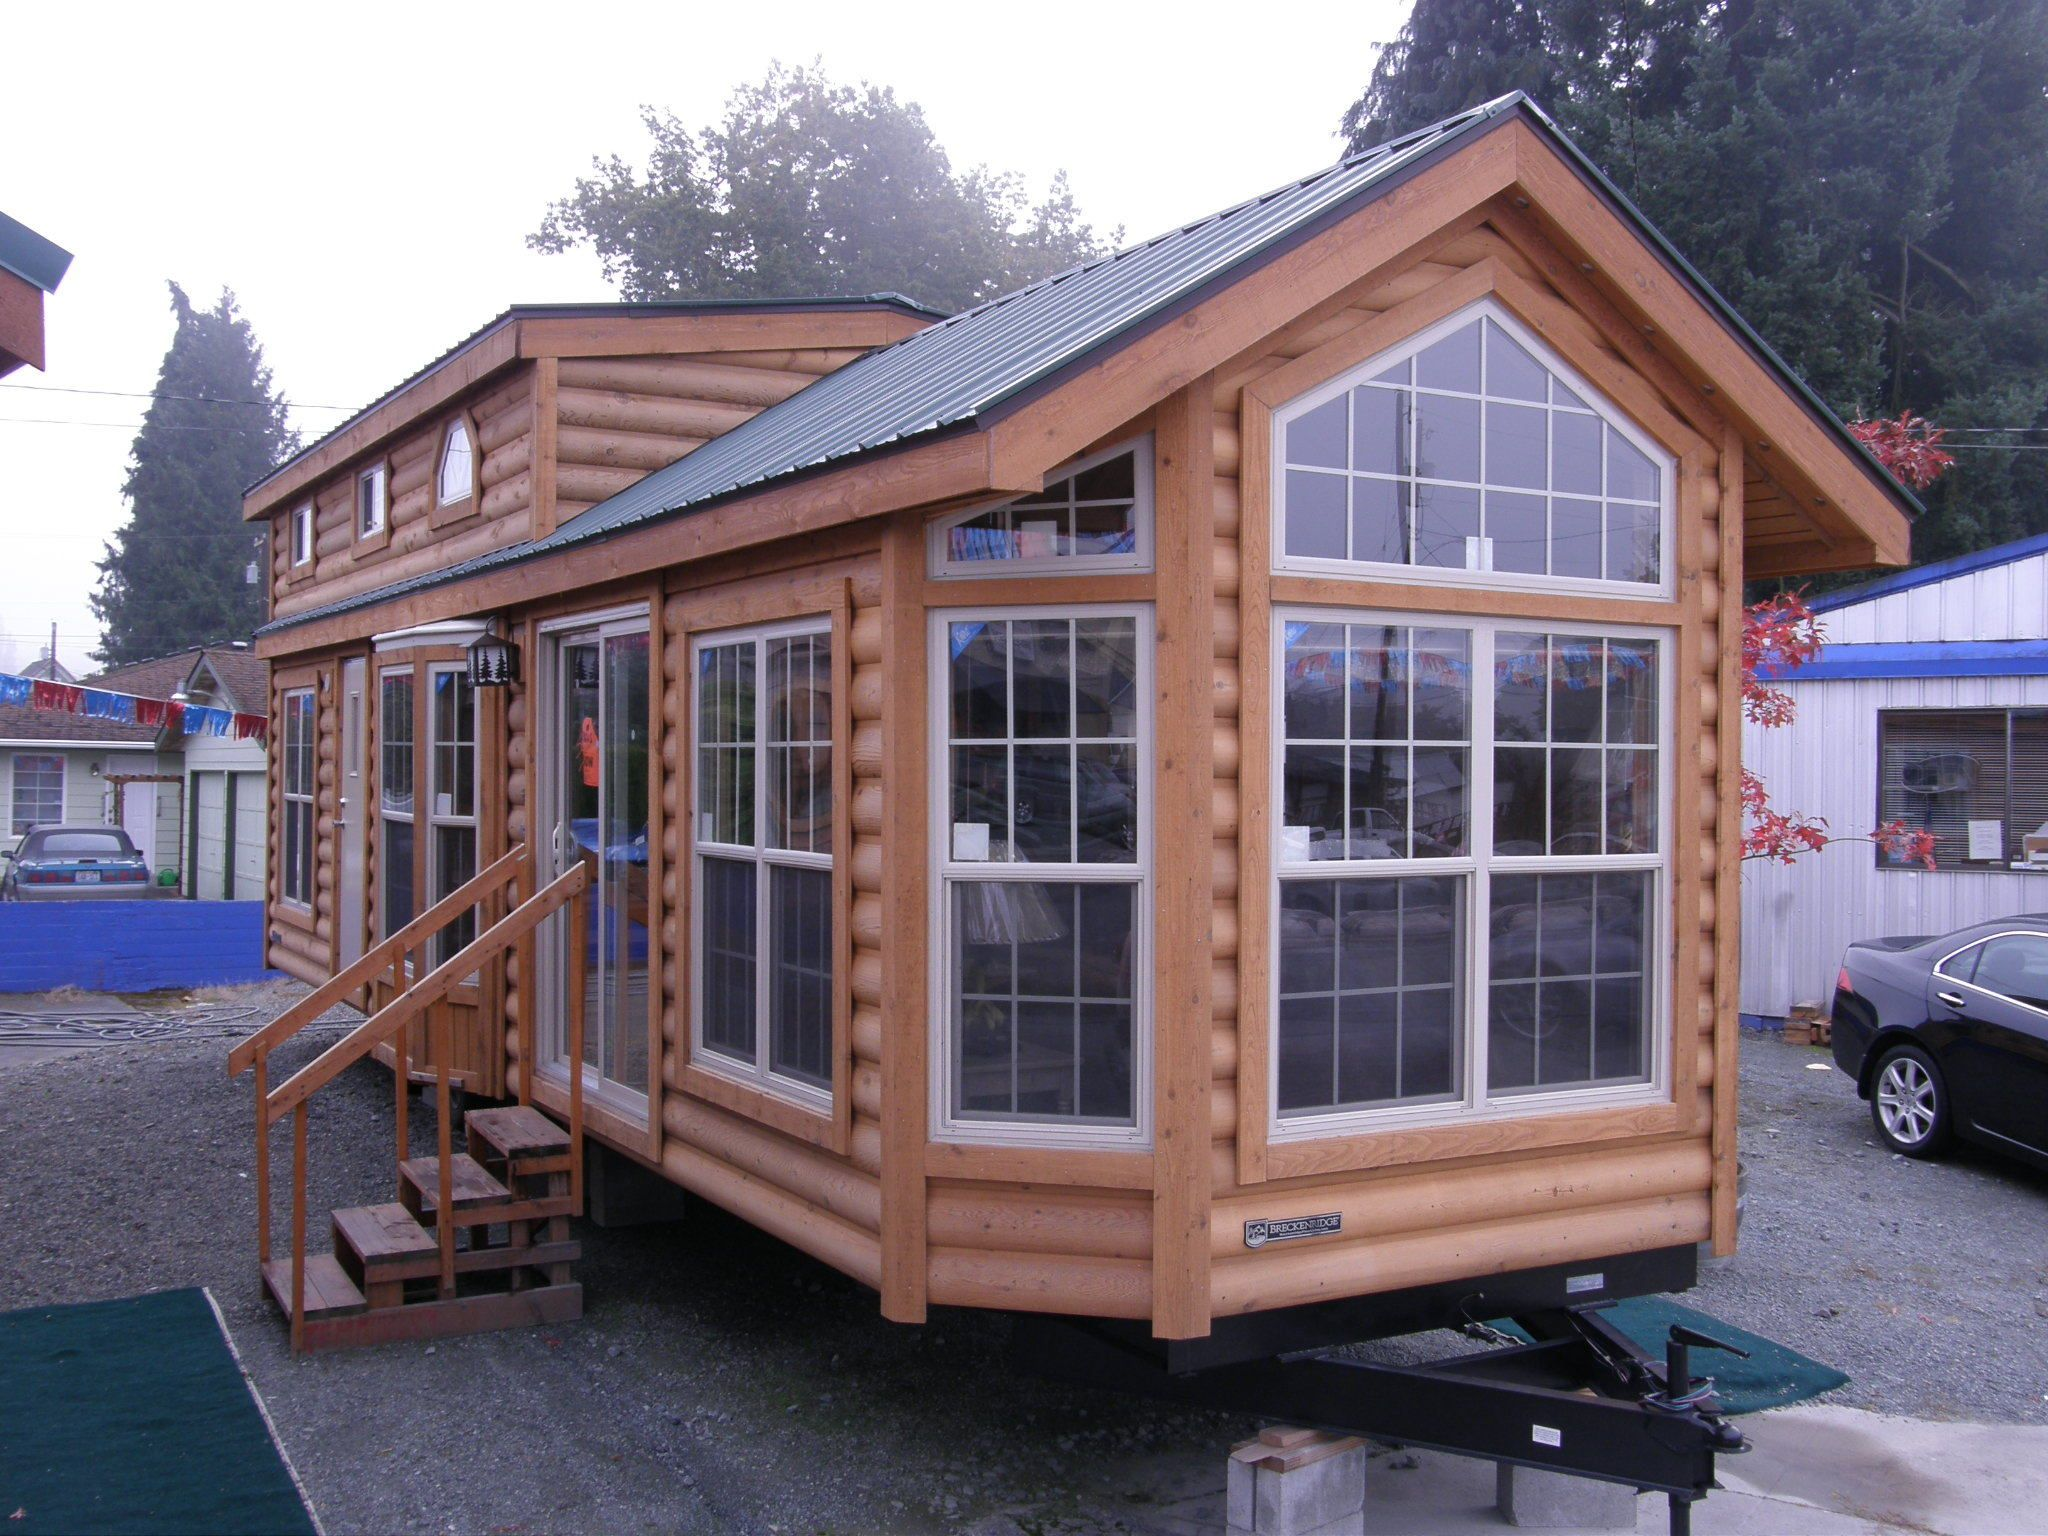 Visit Open Big-Tiny House On